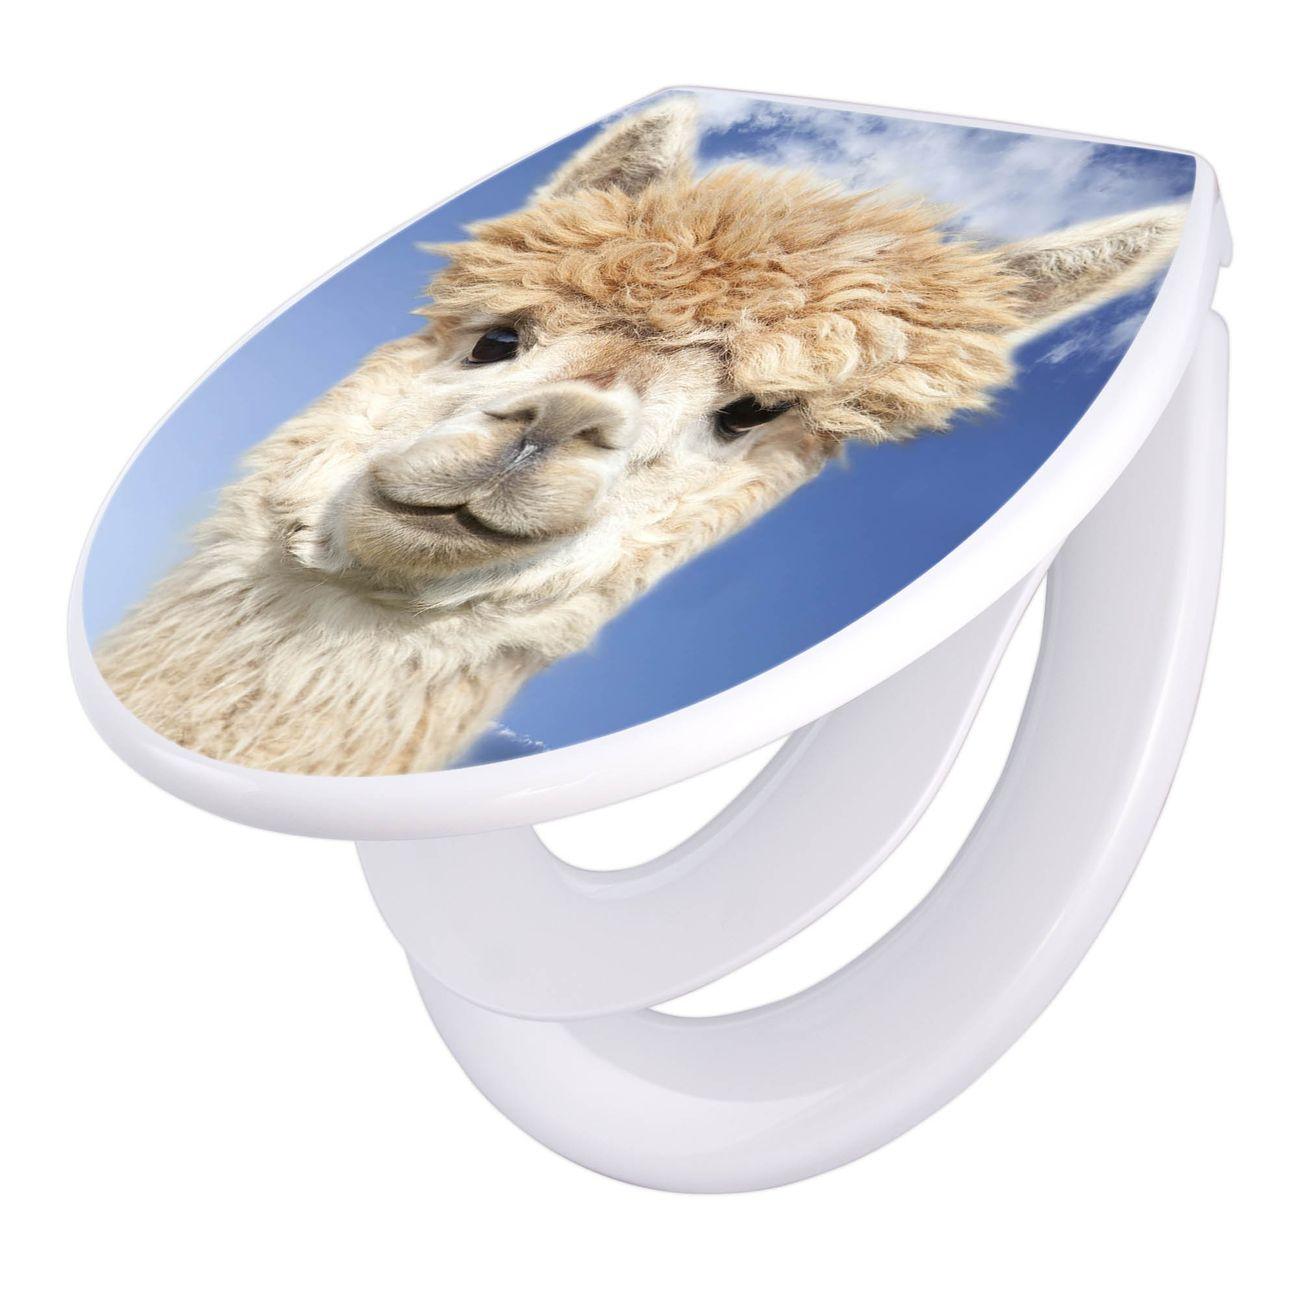 Toilettendeckel weiß mit Absenkautomatik Motiv Lama